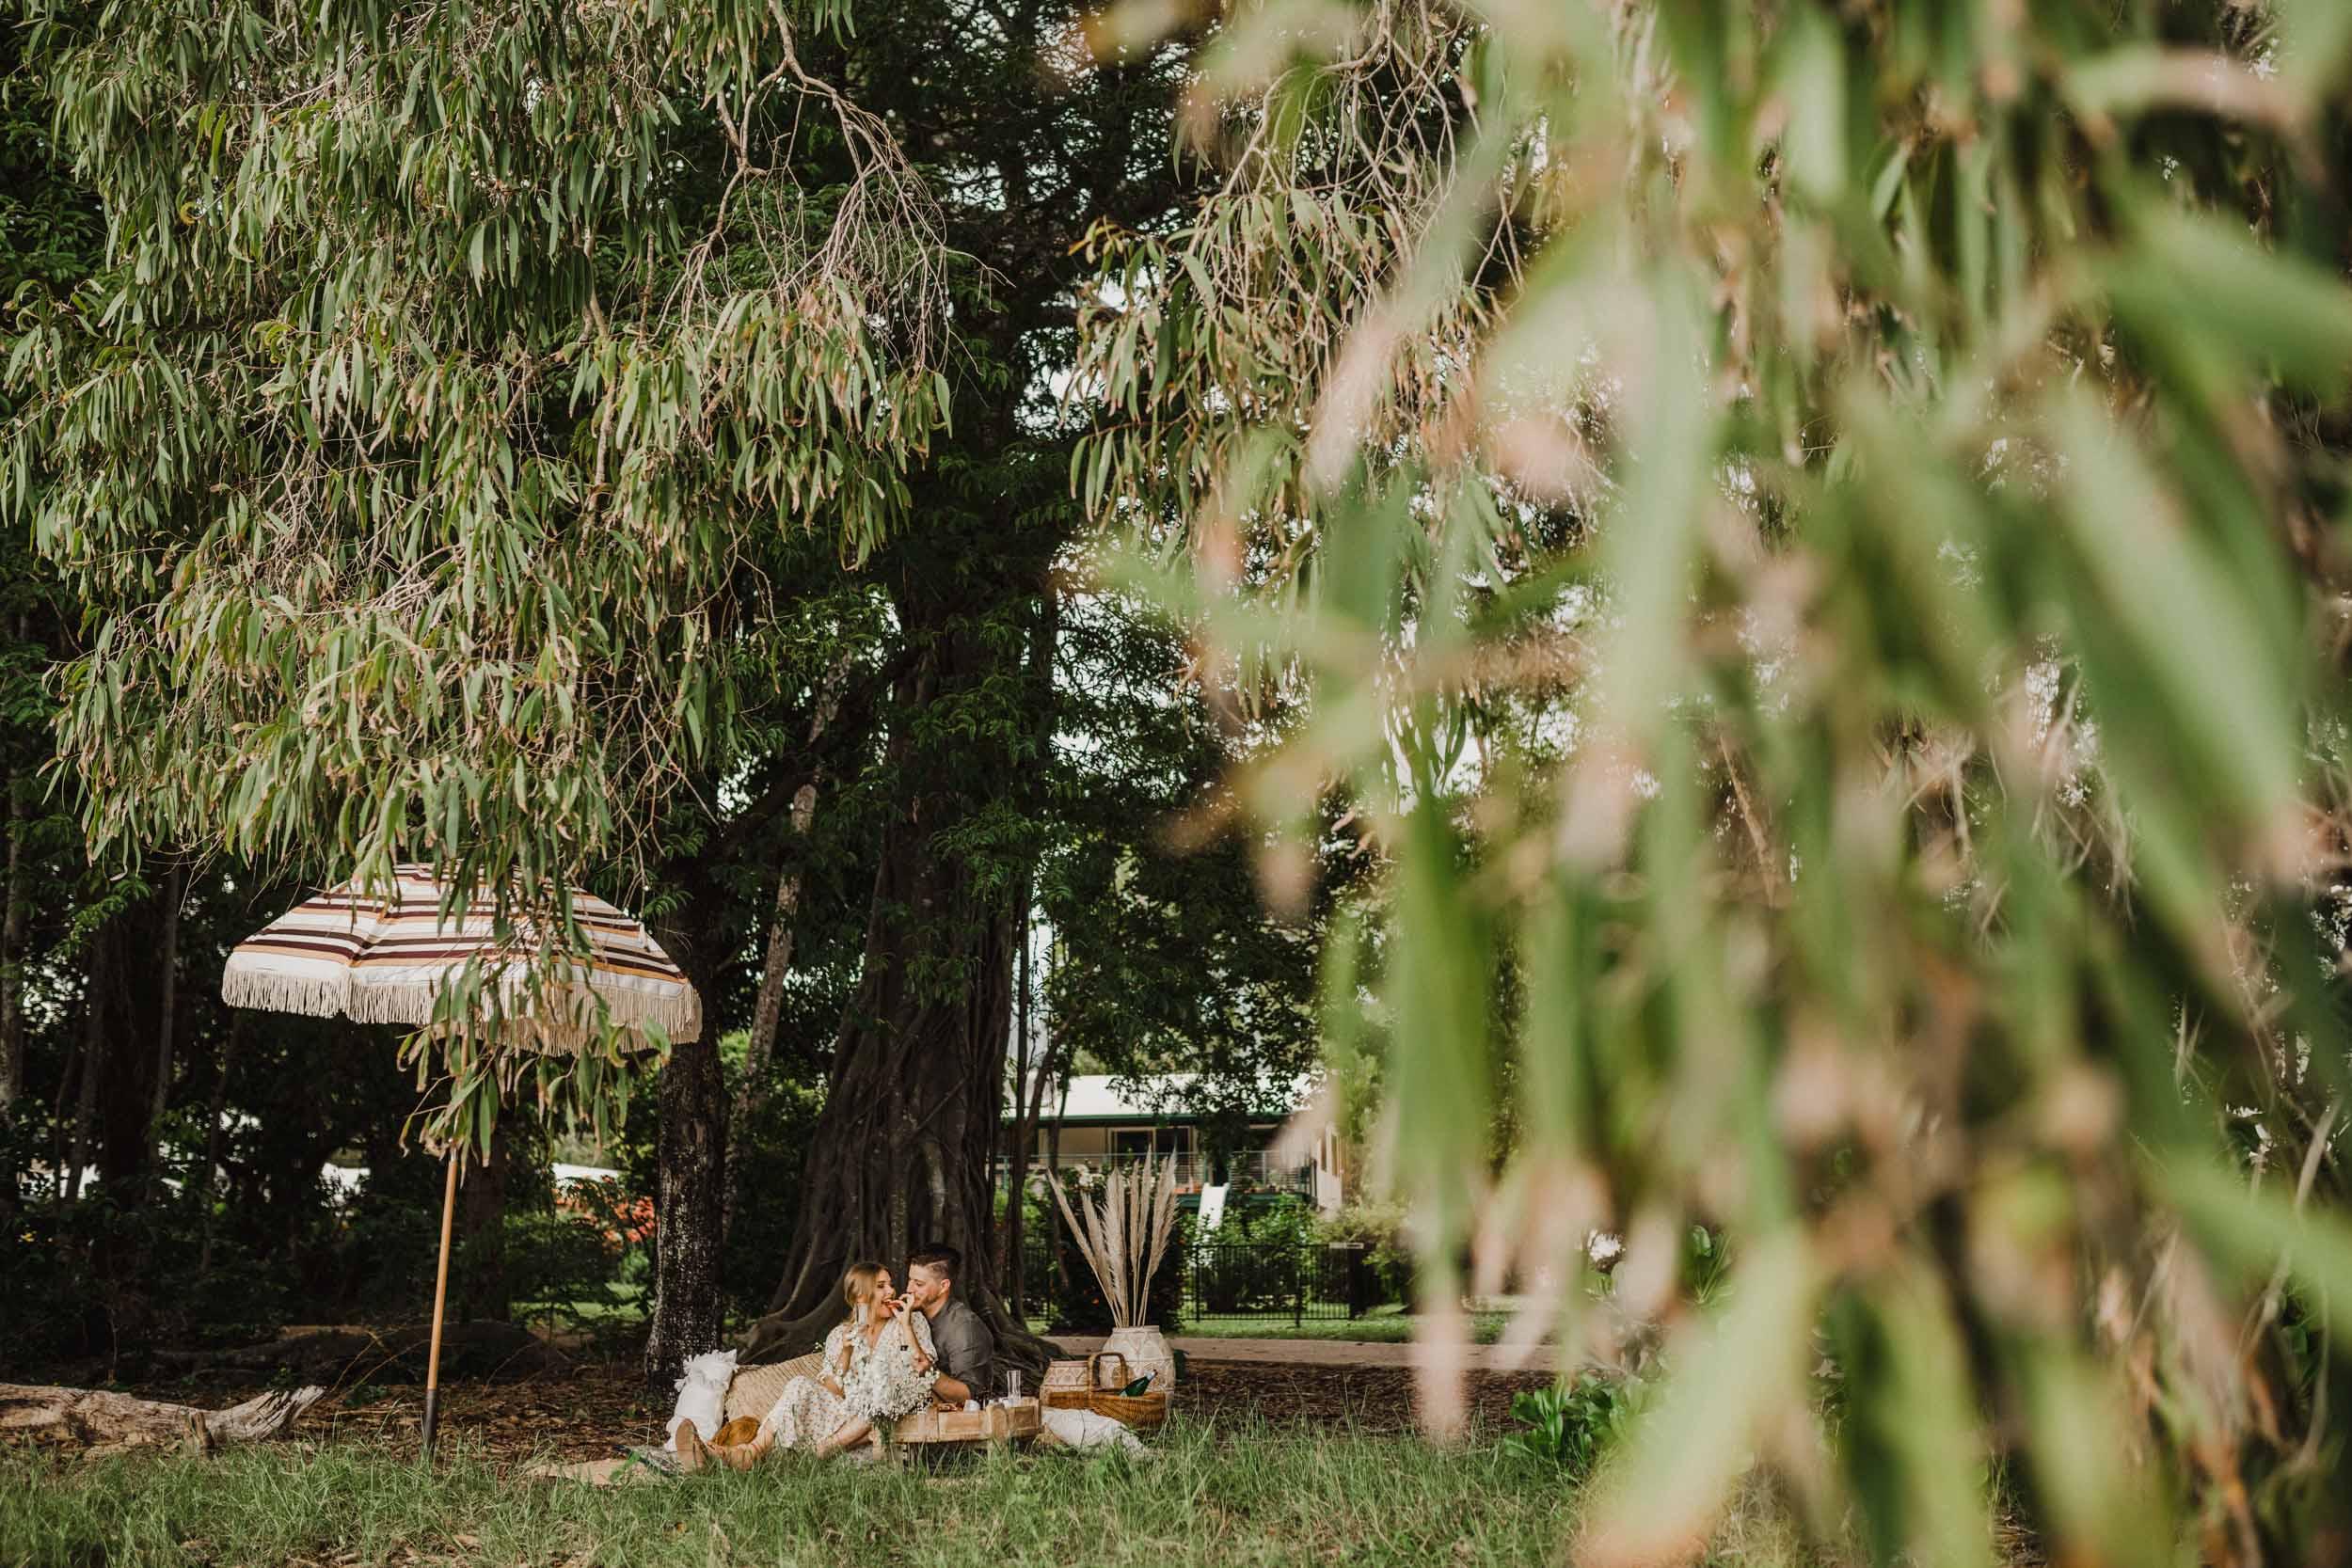 The Raw Photographer - Cairns Wedding Photographer - Beach Engagement Shoot - Candid Picnic-12.jpg